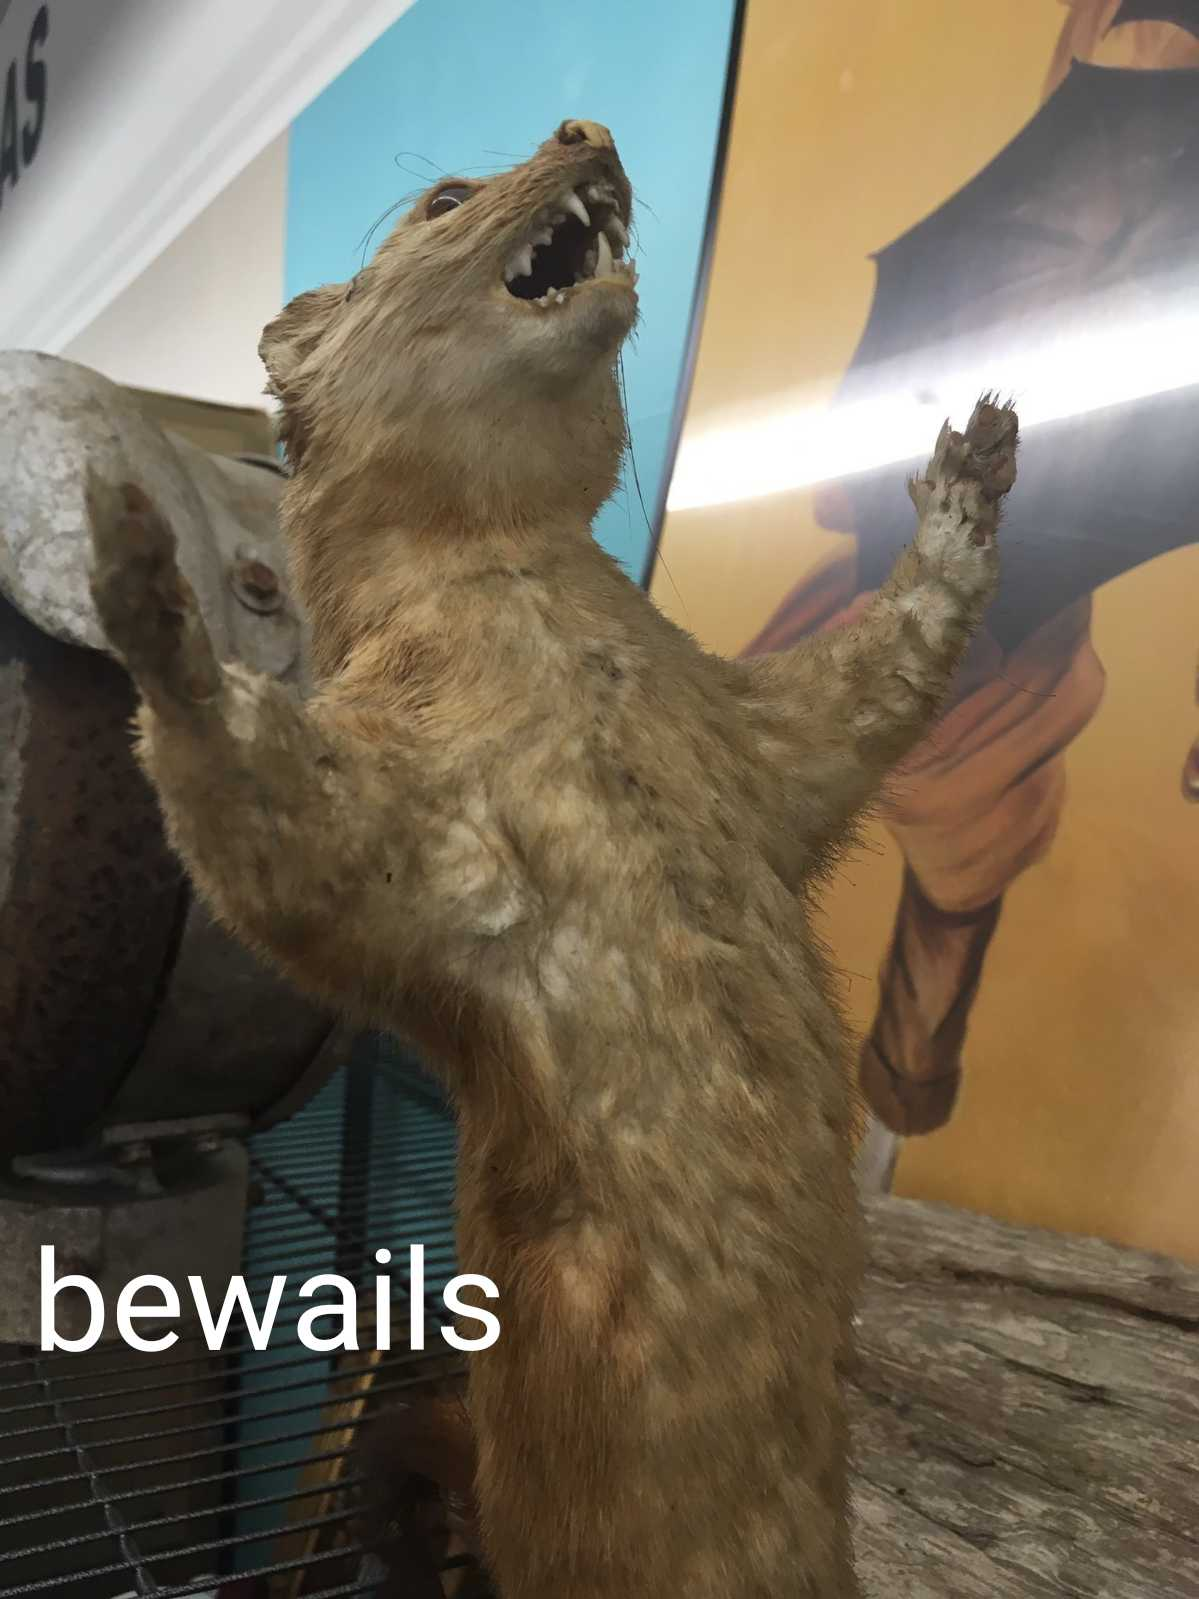 Bewails.jpg